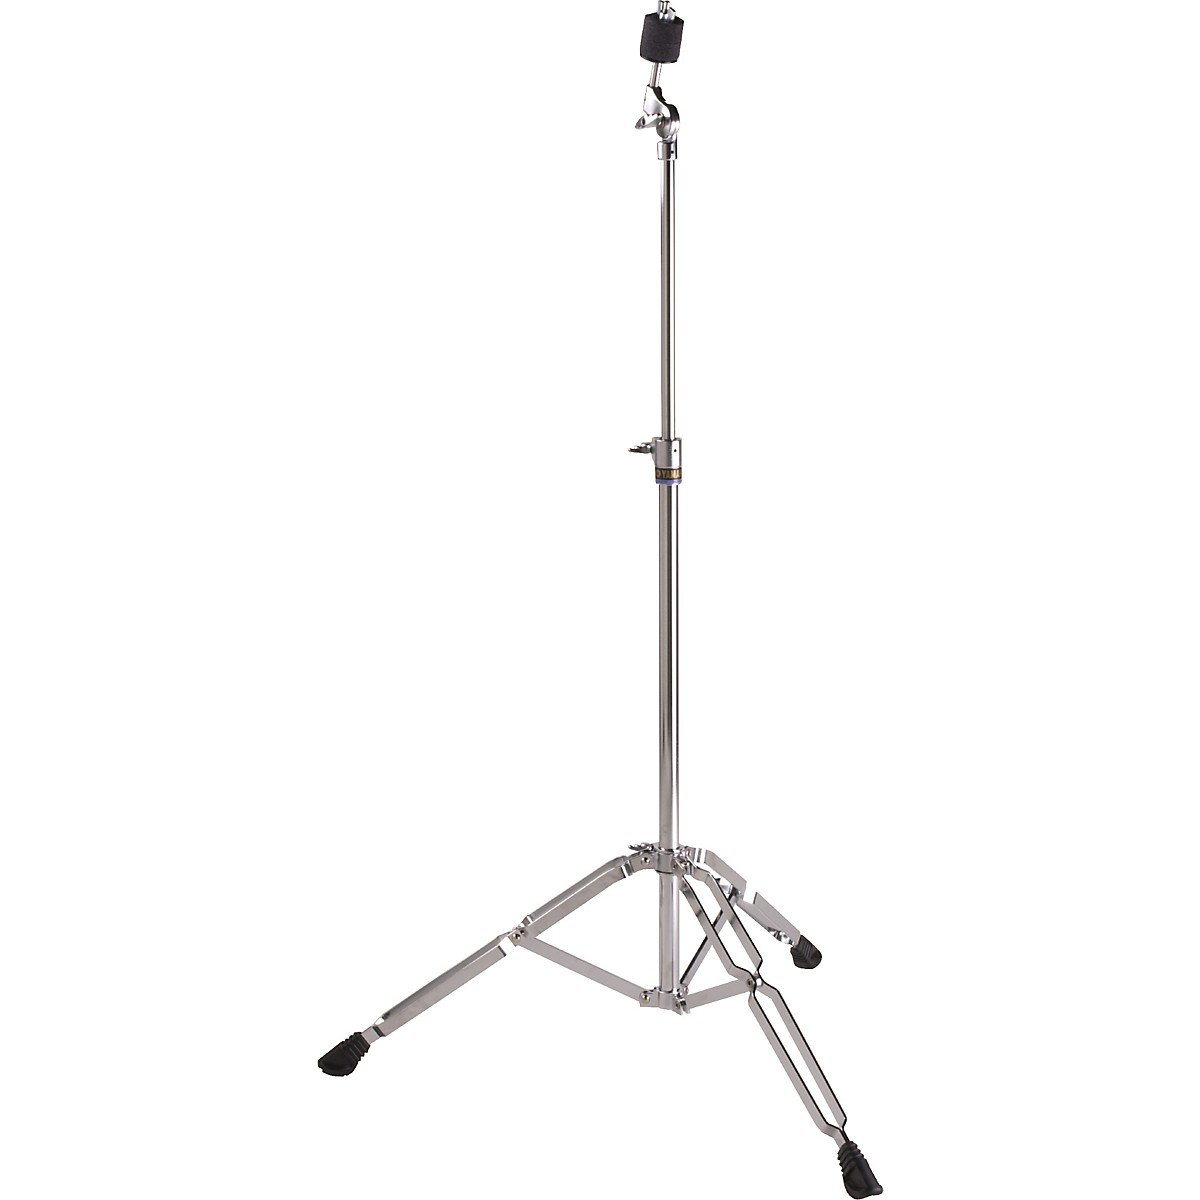 Yamaha Double-Braced Lightweight Straight Cymbal Stand